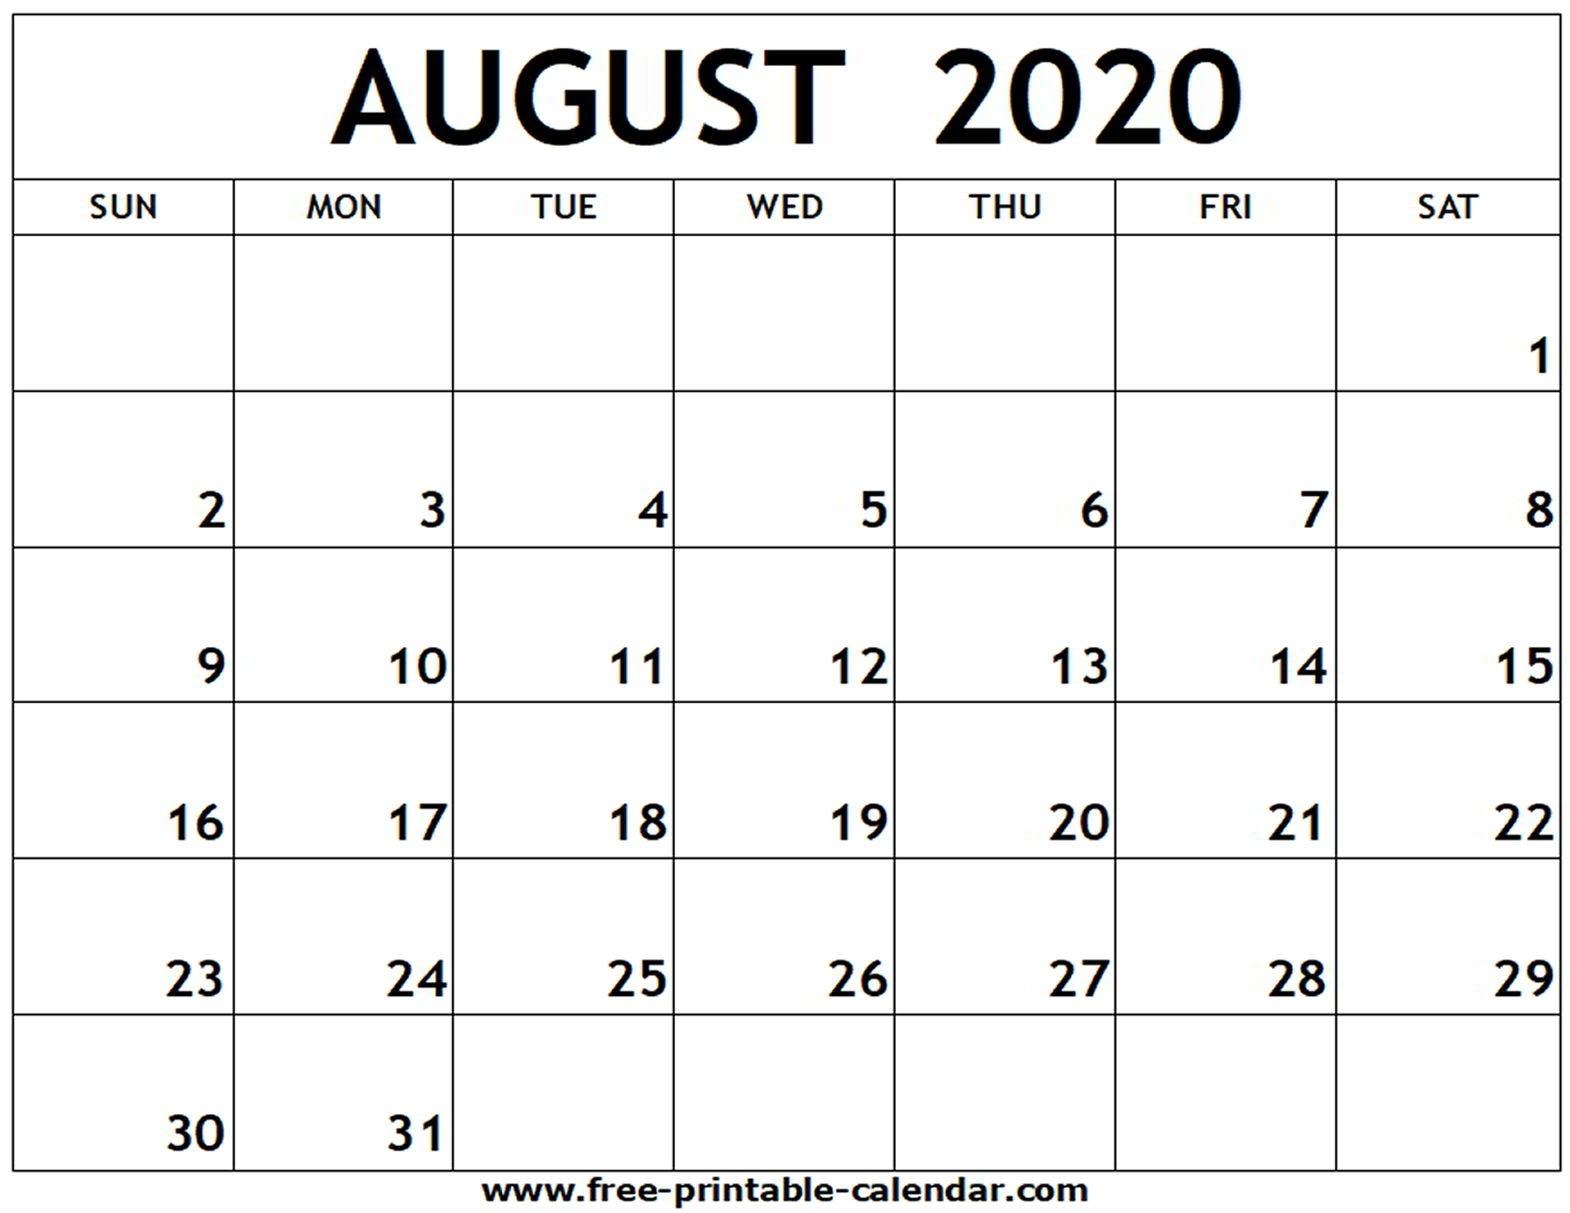 August 2020 Printable Calendar - Free-Printable-Calendar-Printable Blank Monthly Calendar 2020 August